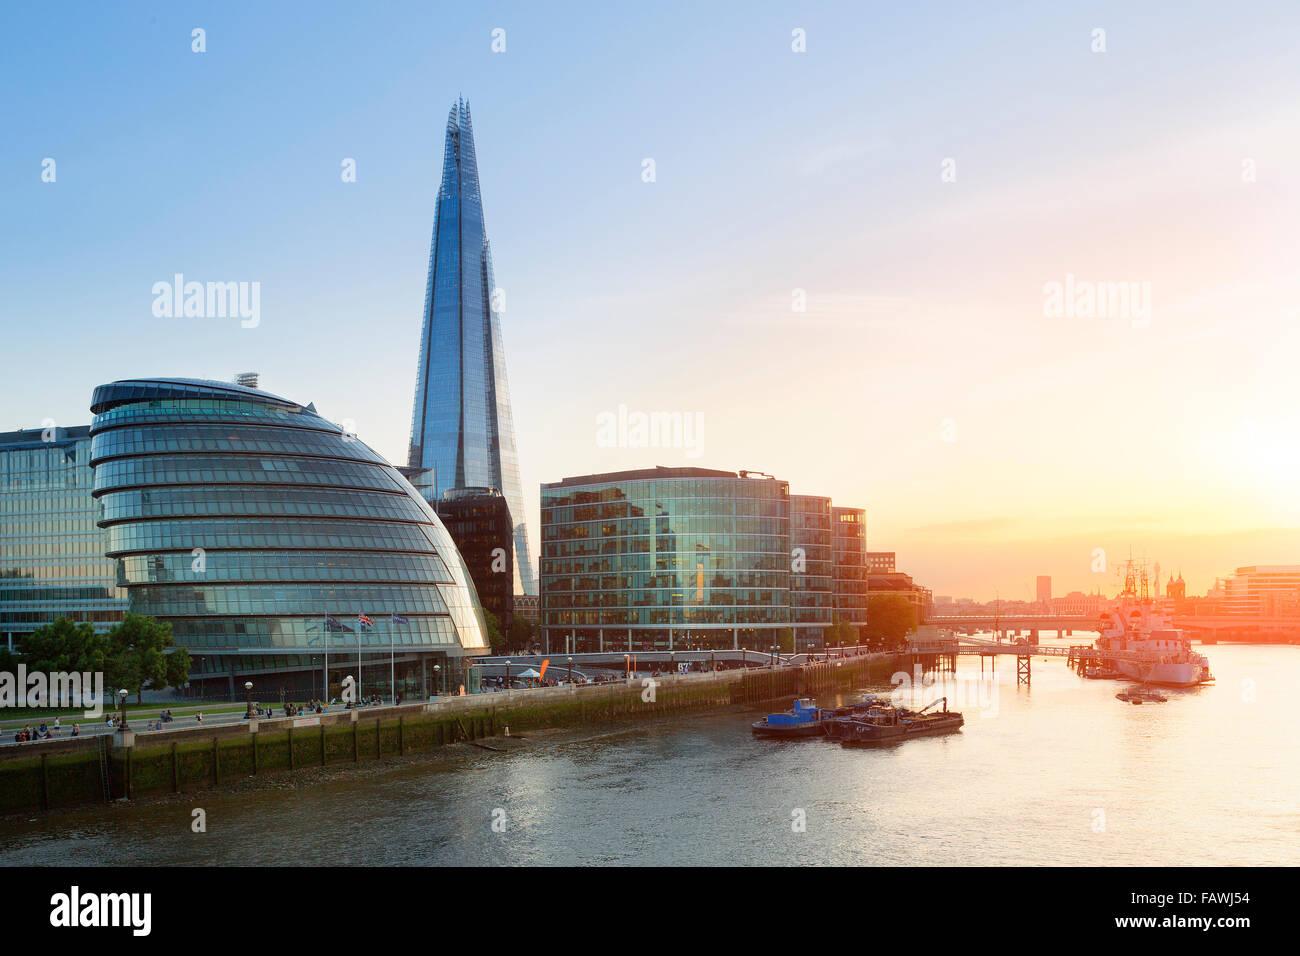 London, Splitter und Rathaus bei Sonnenuntergang Stockbild